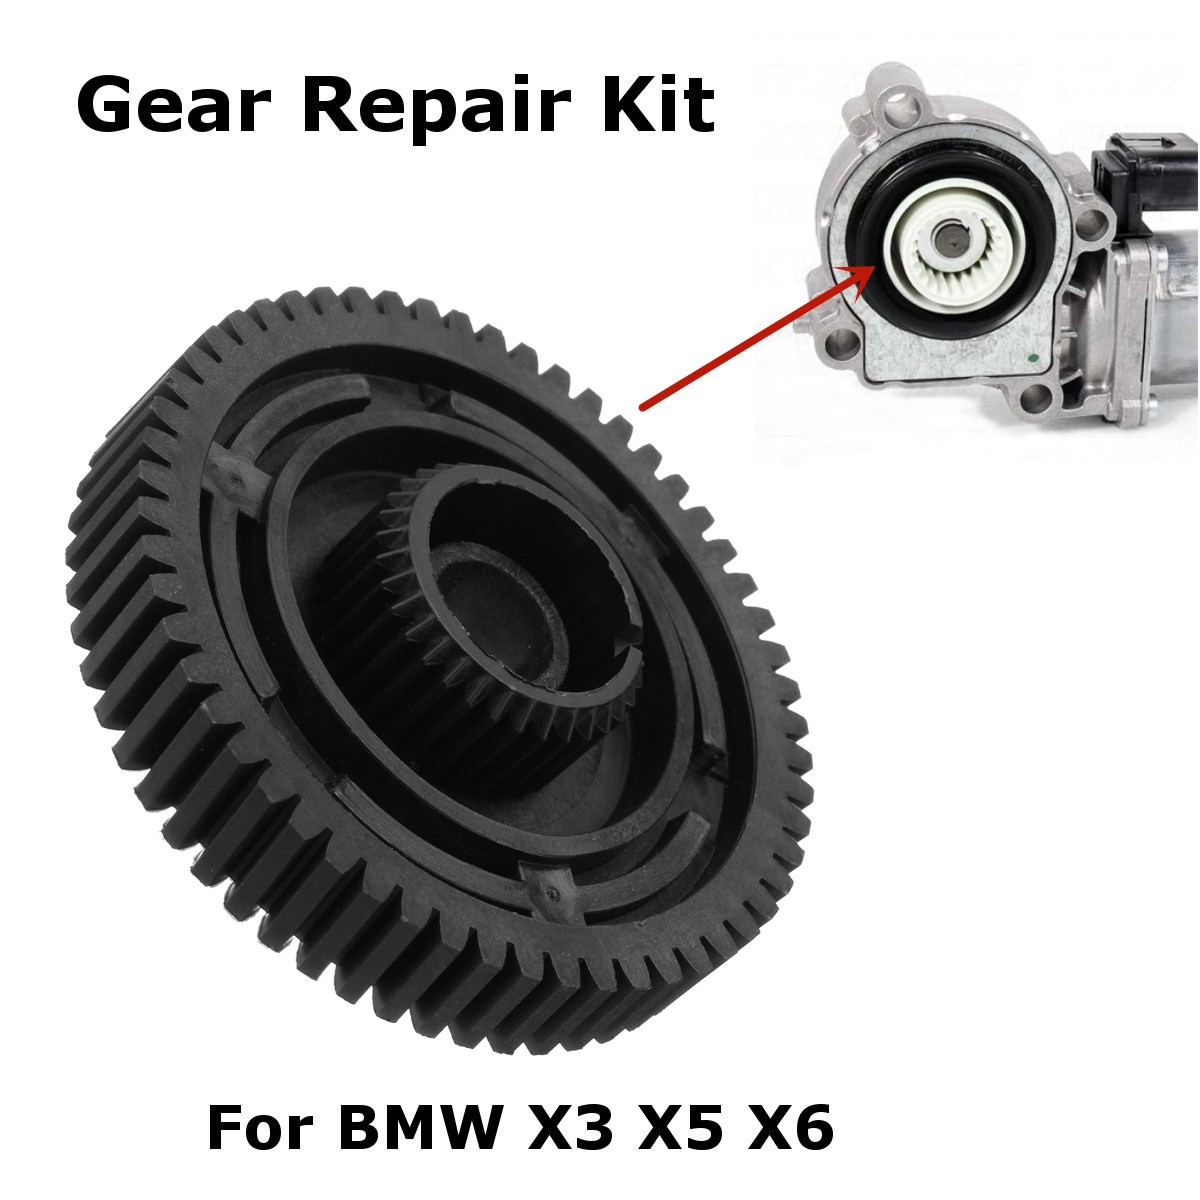 Repair Gear Box Servo Actuator Motor Transfer Case For BMW X3 X5 X6 E83 E53 E70 27107566296